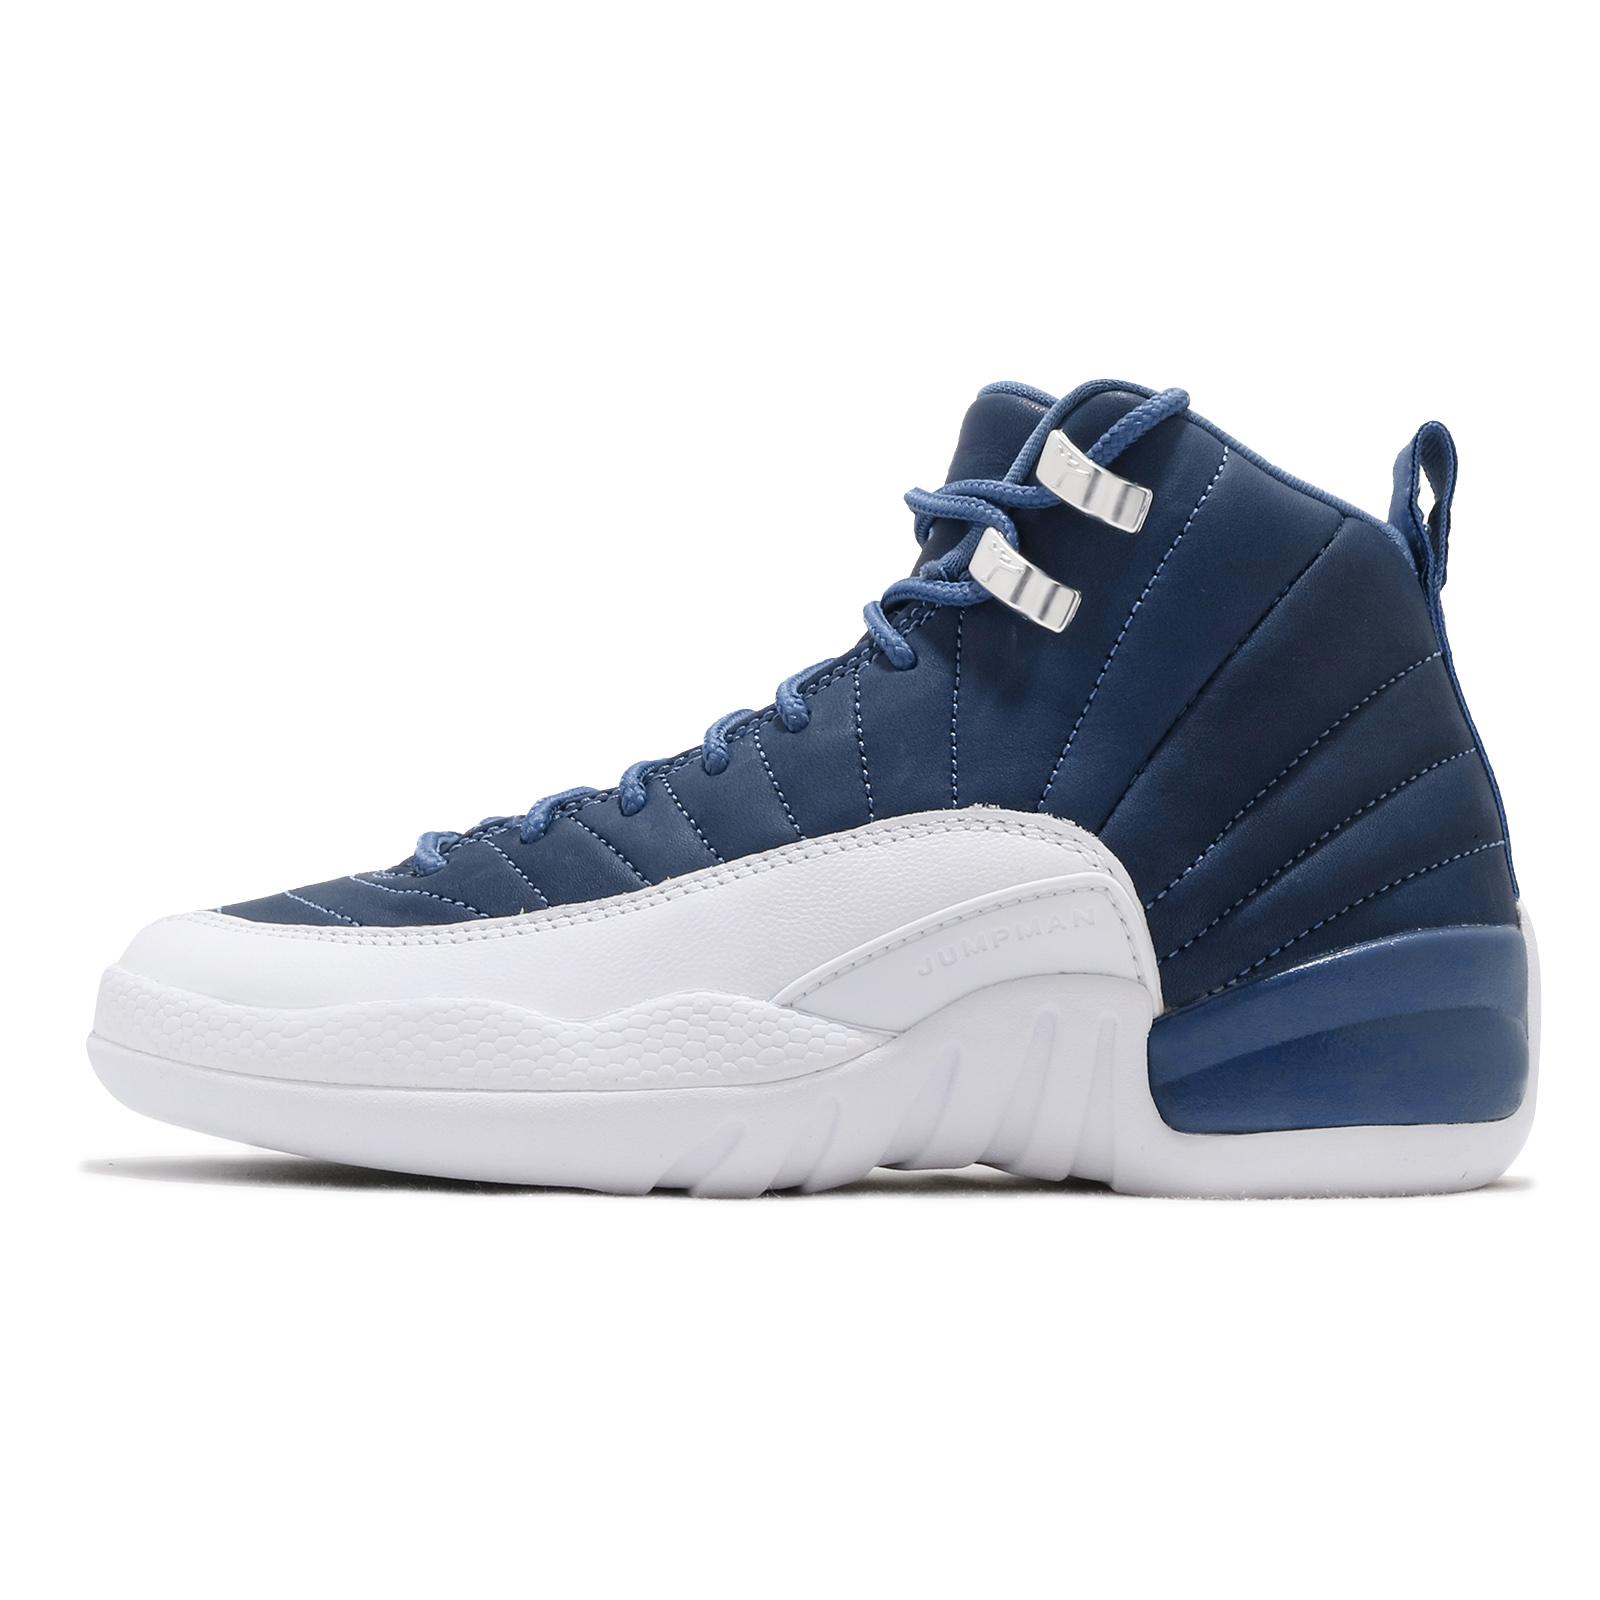 Nike 籃球鞋 Air Jordan 12 Retro 藍 白 女鞋 喬丹 AJ12 【ACS】 DB5595-404